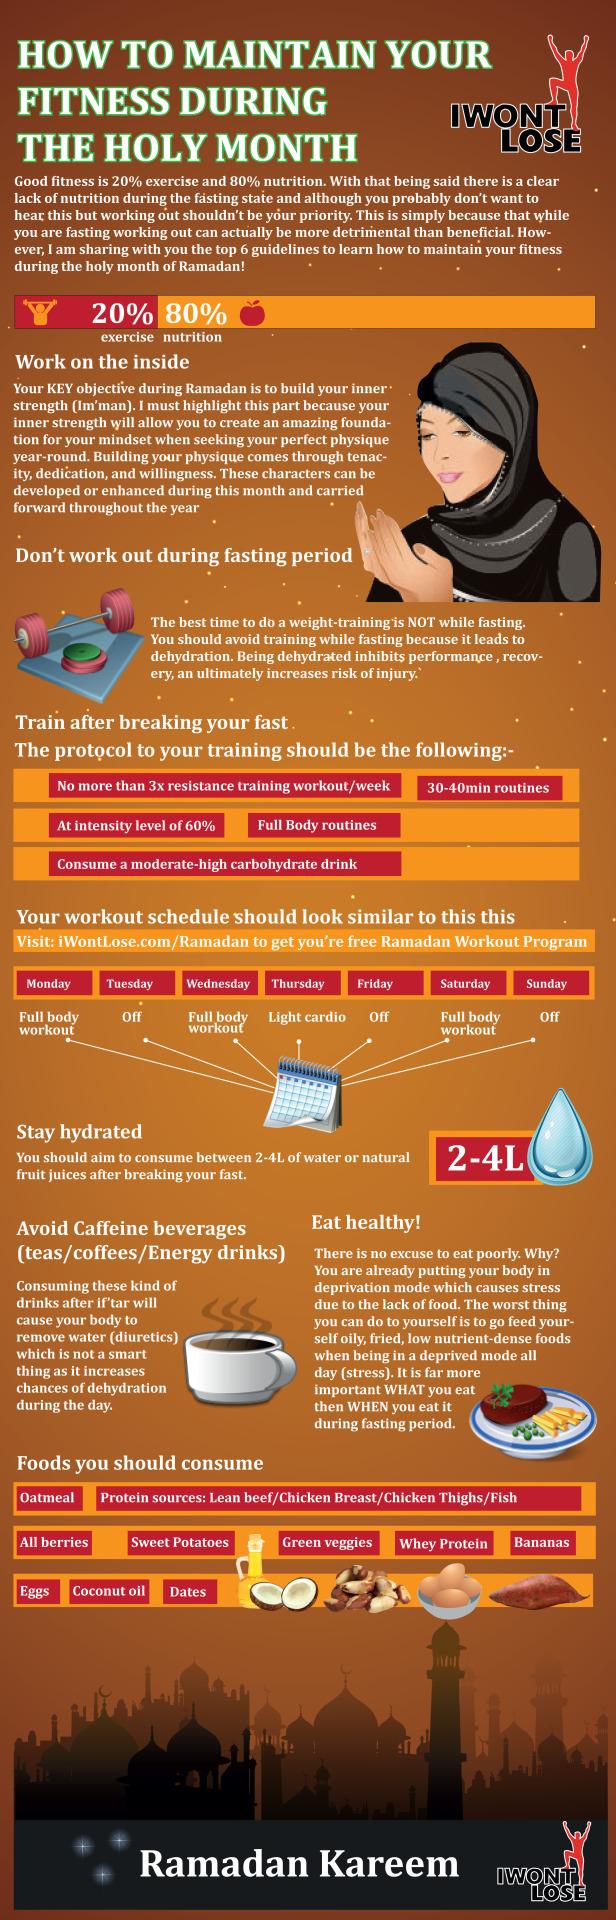 fitness-during-ramadan